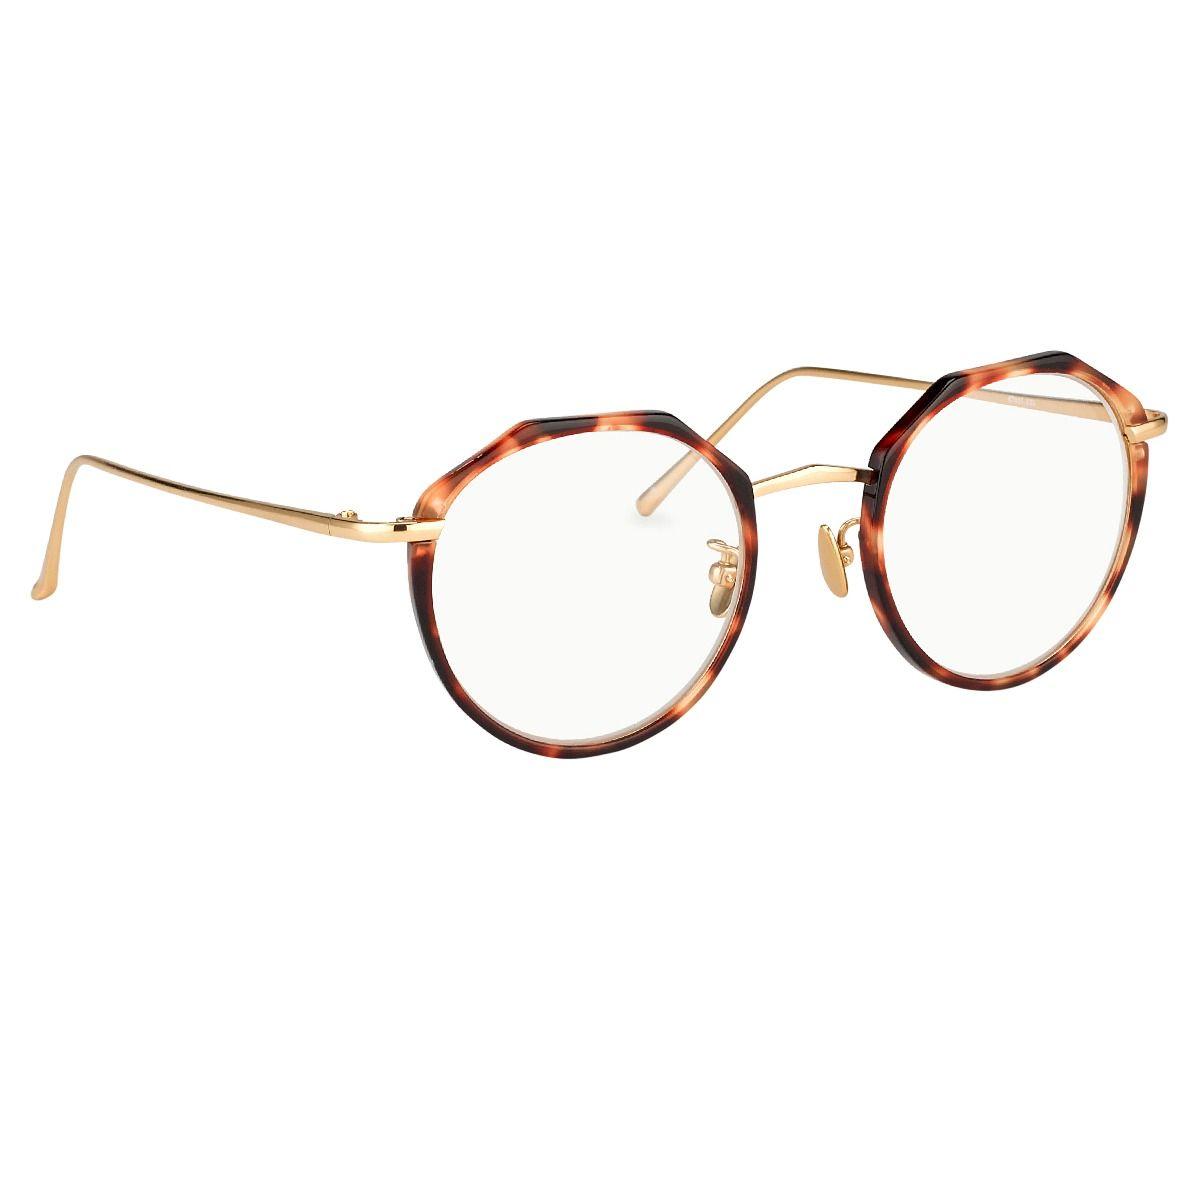 743b4c088718 Linda Farrow 367 C3 Oval Optical Frame